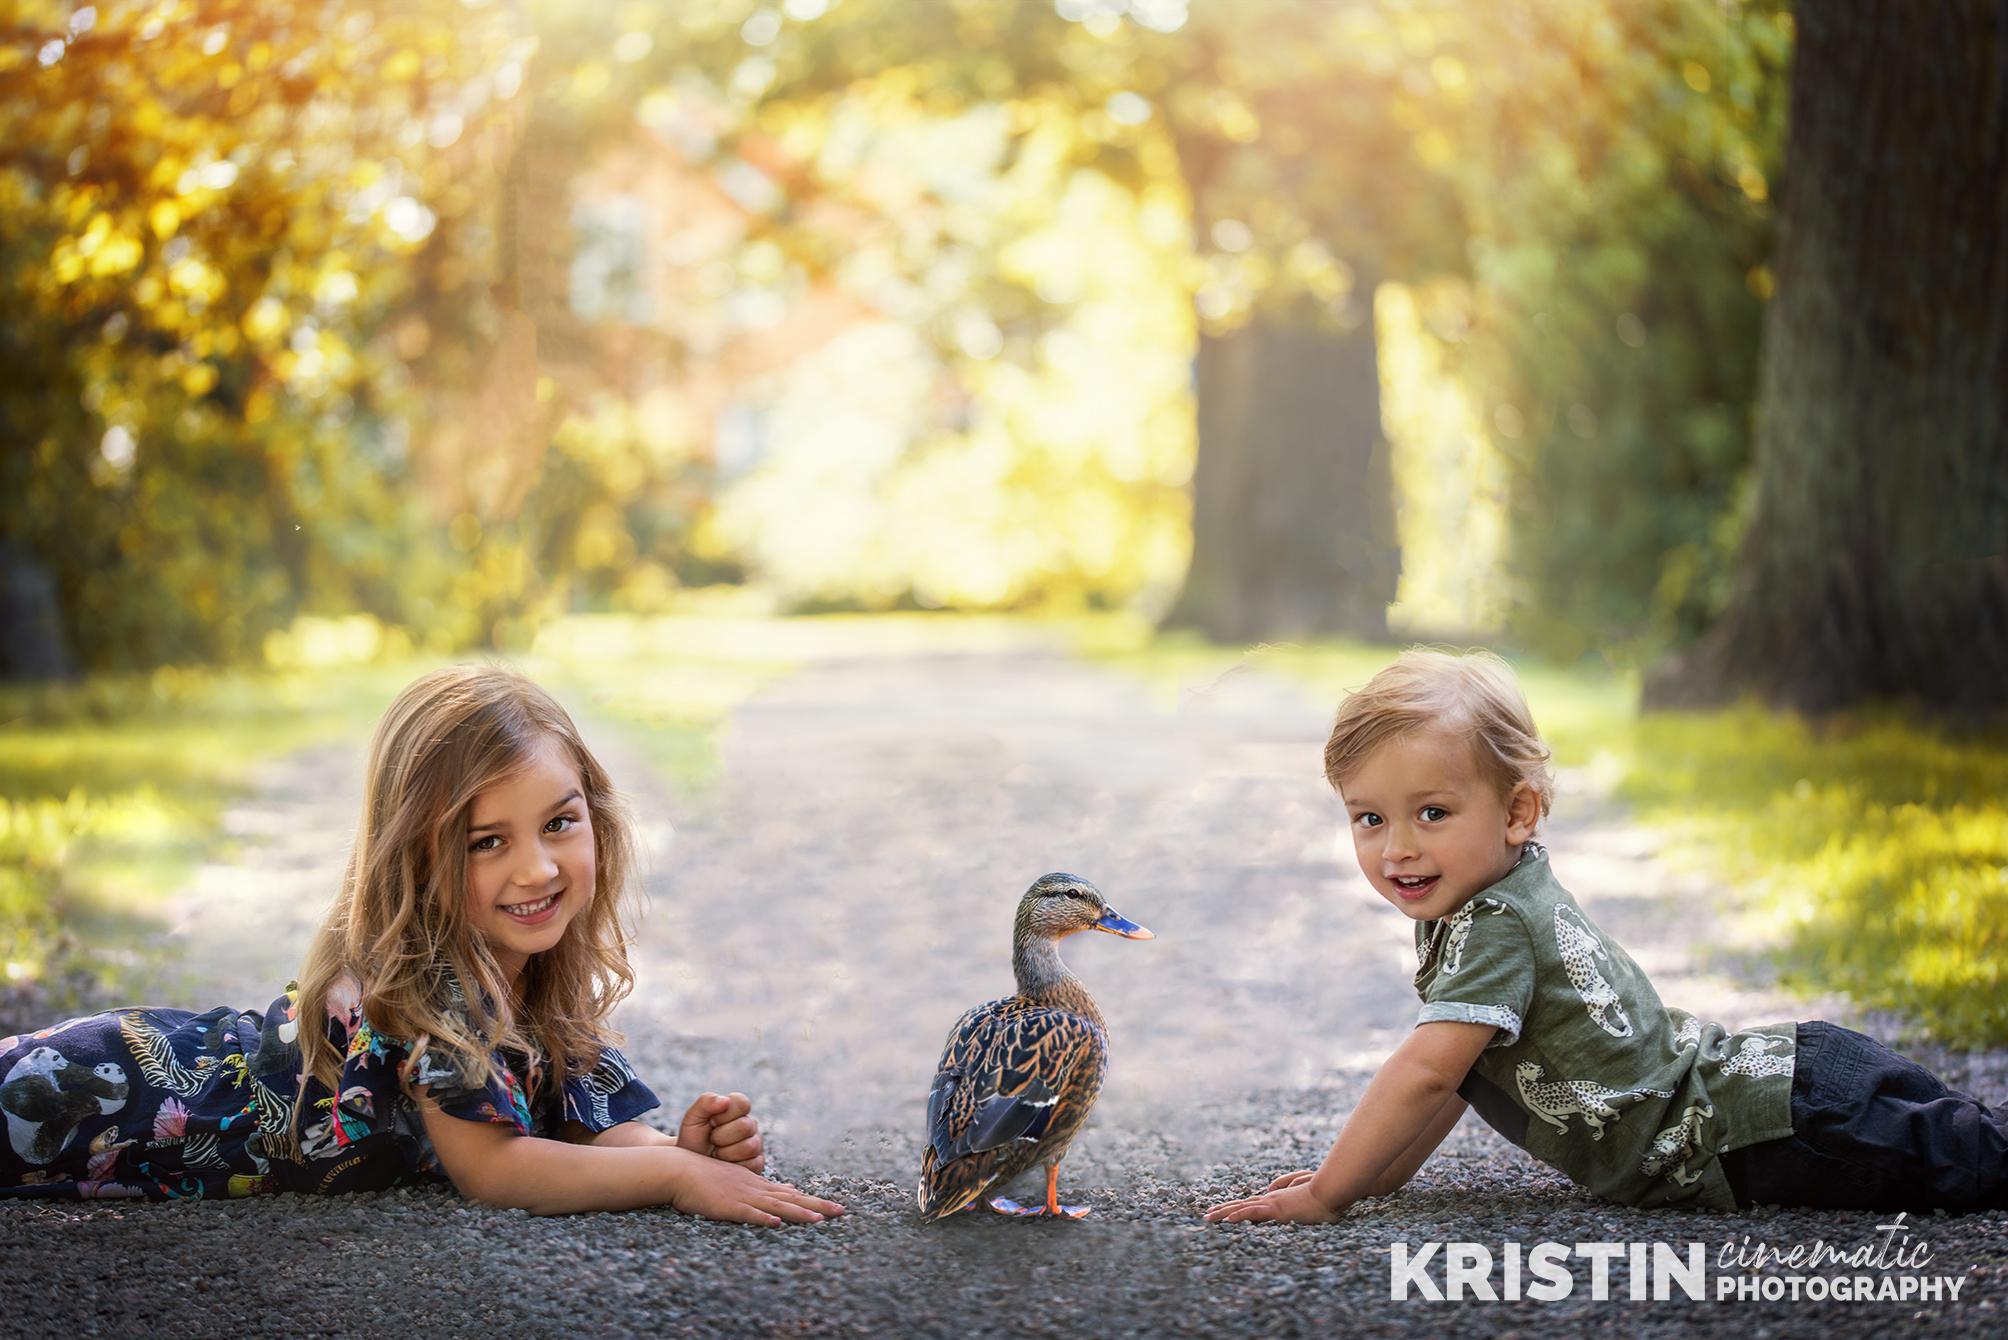 Fotograf i Eskilstuna Kristin - Photography-5Bcop.jpg